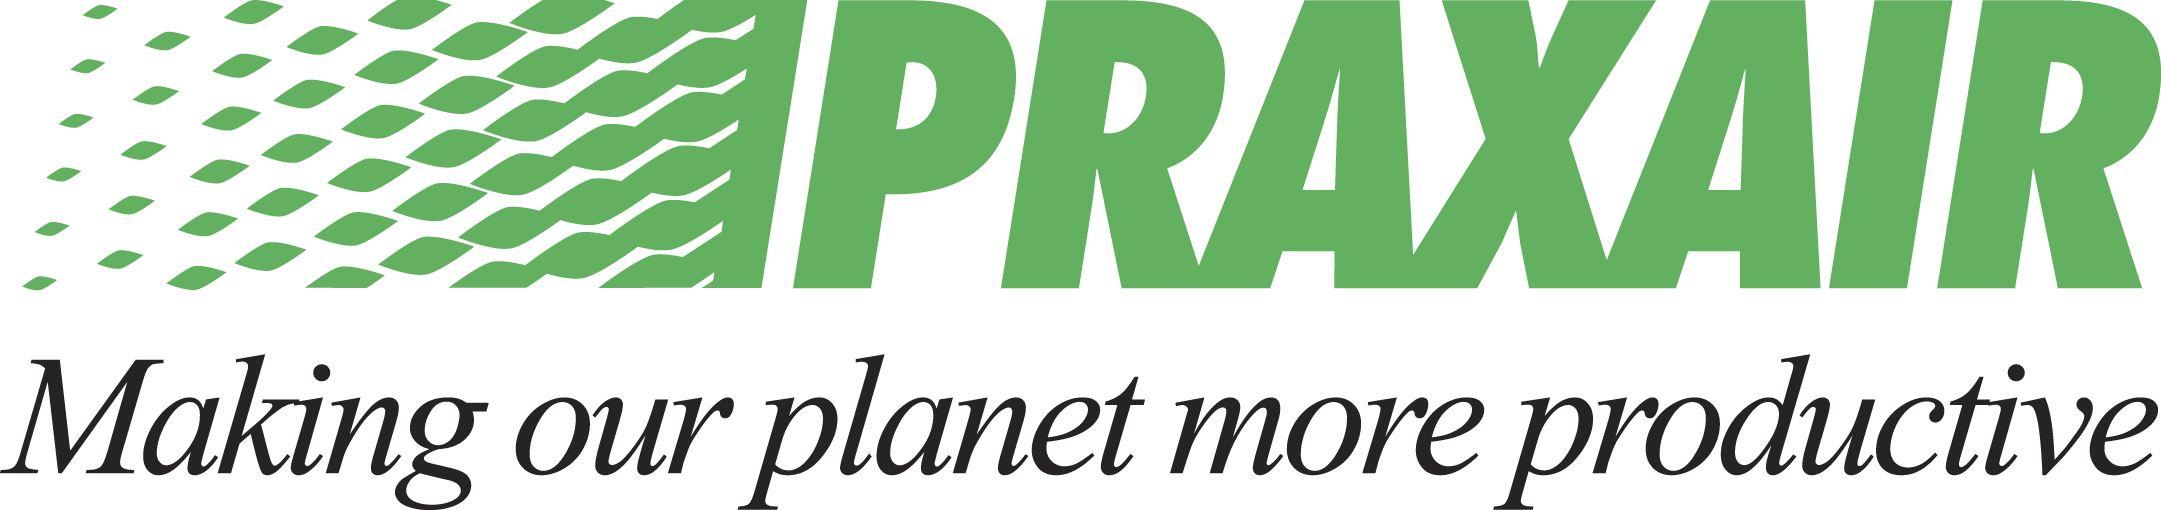 praxair_logo.jpg